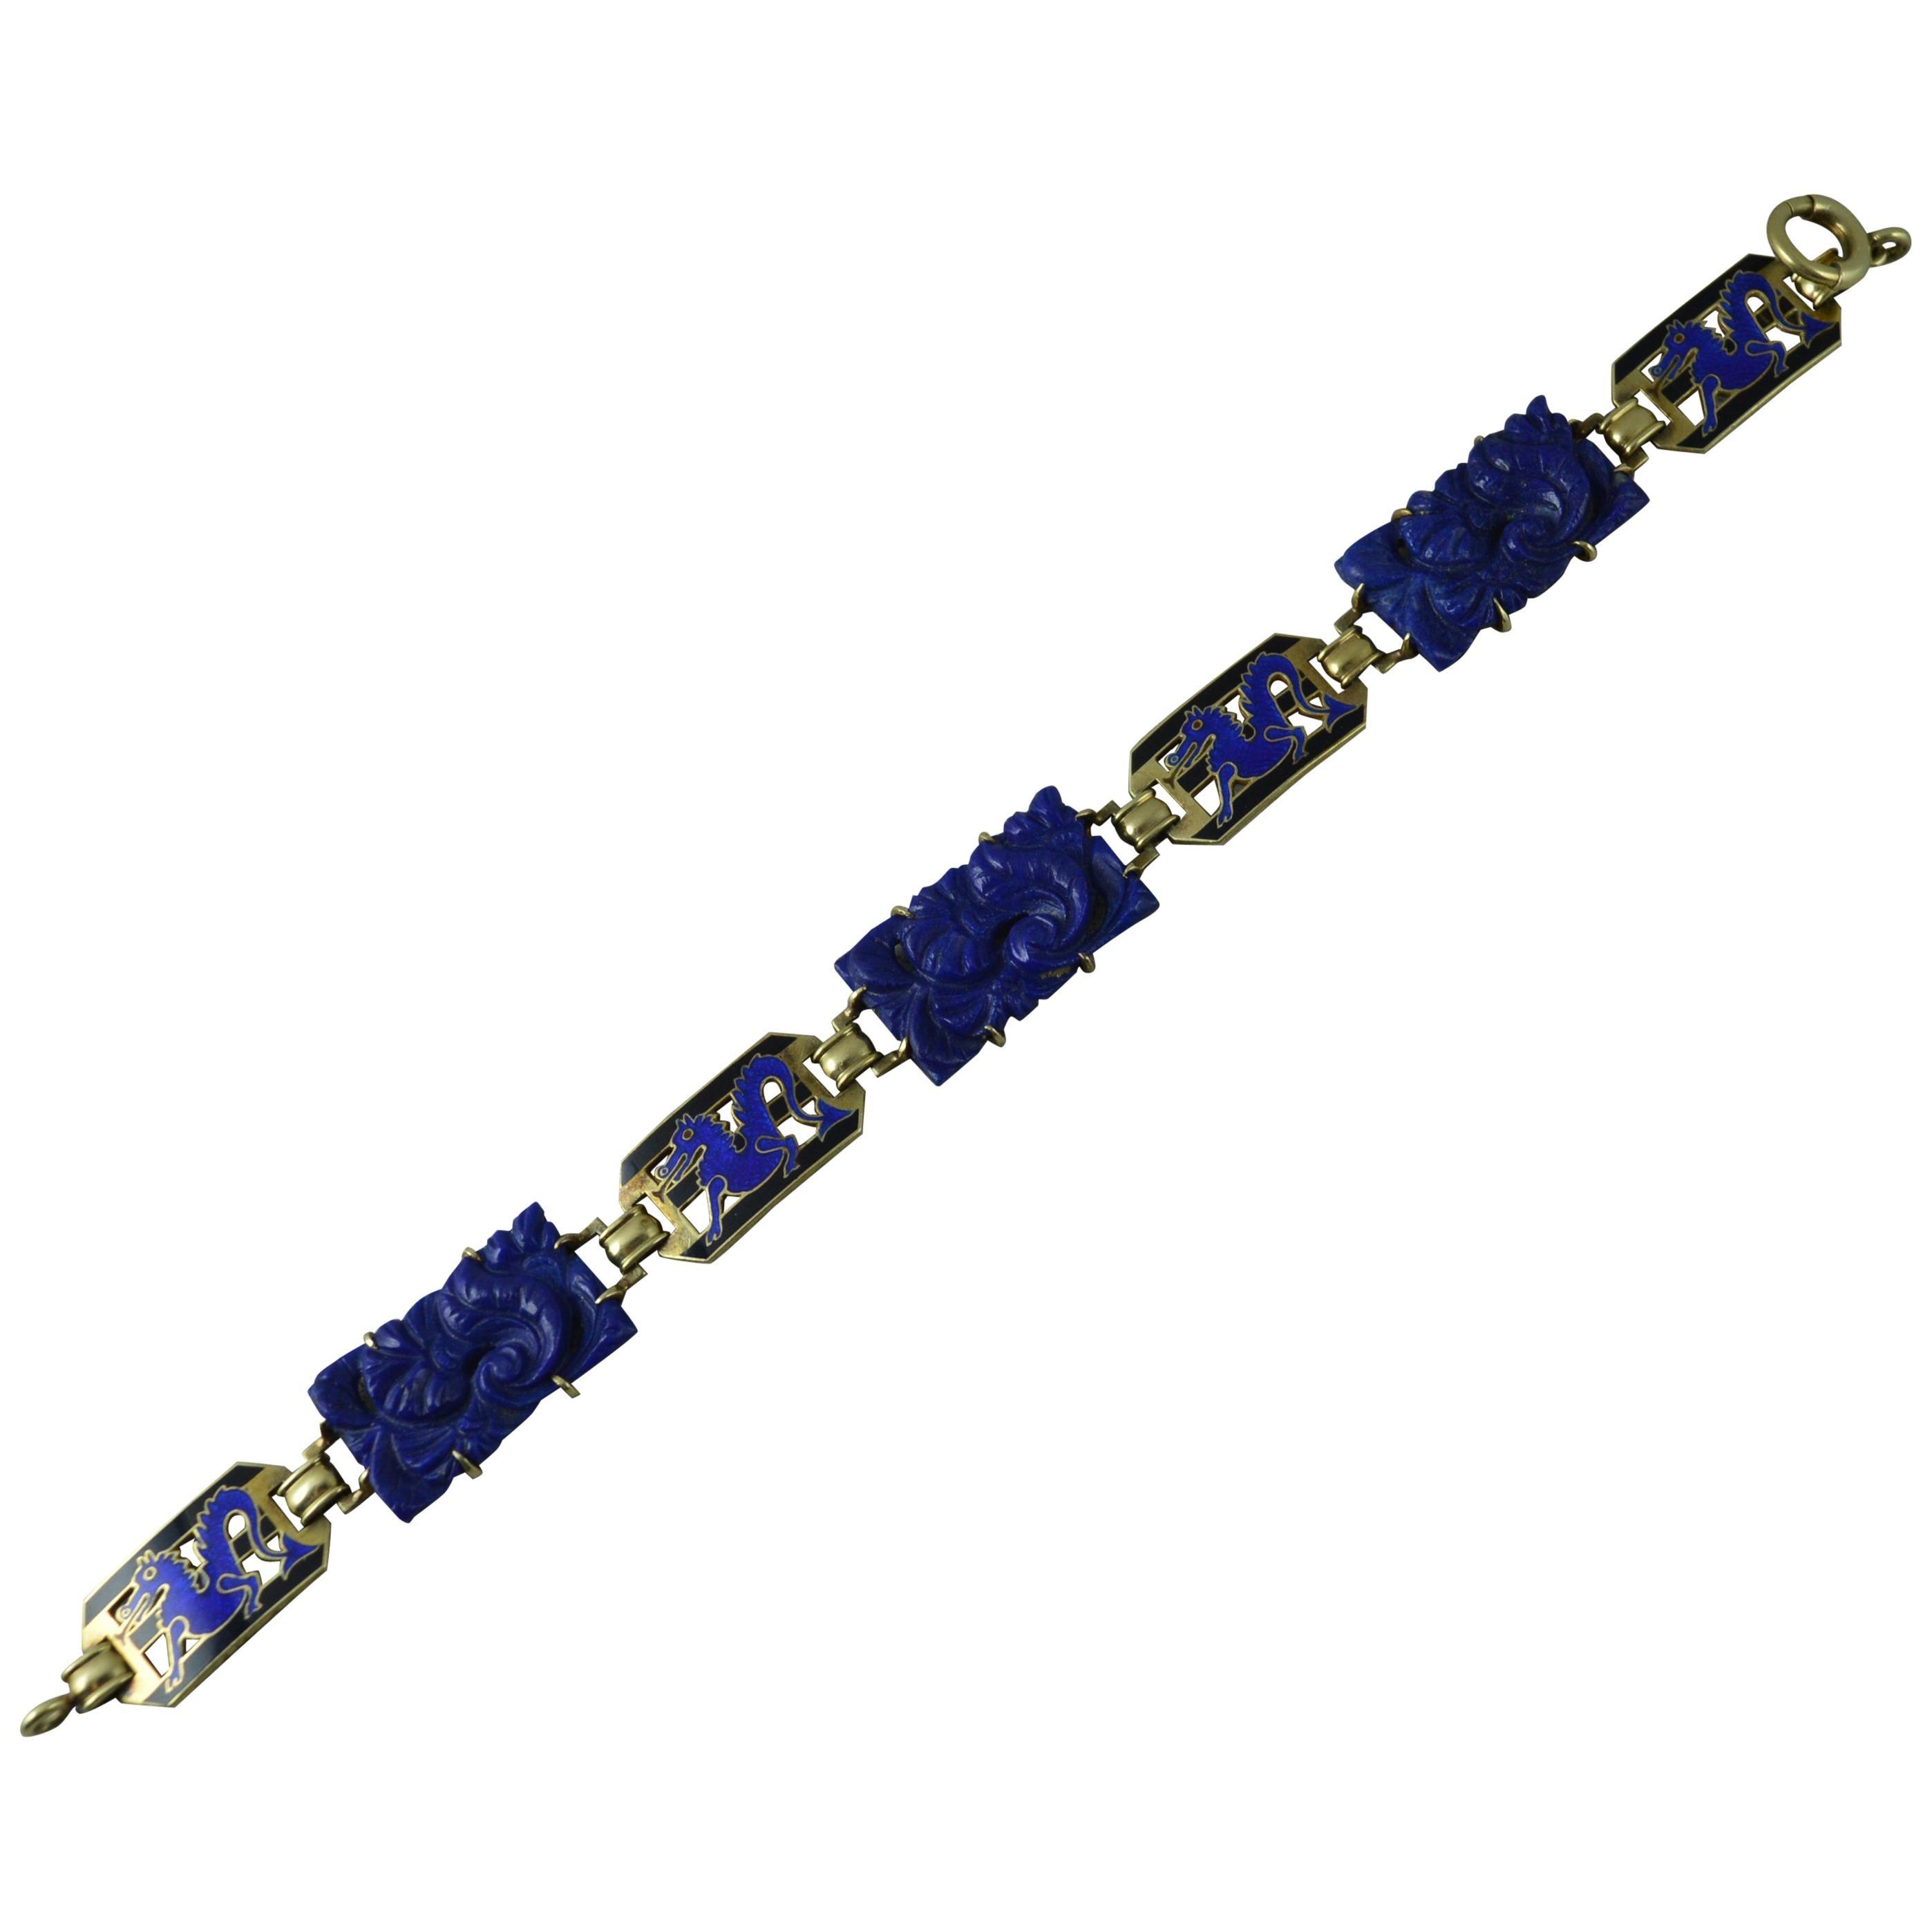 "Vintage 14 Carat Gold Lapis Lazuli and Enamel Bracelet 7 1/2"" Long"